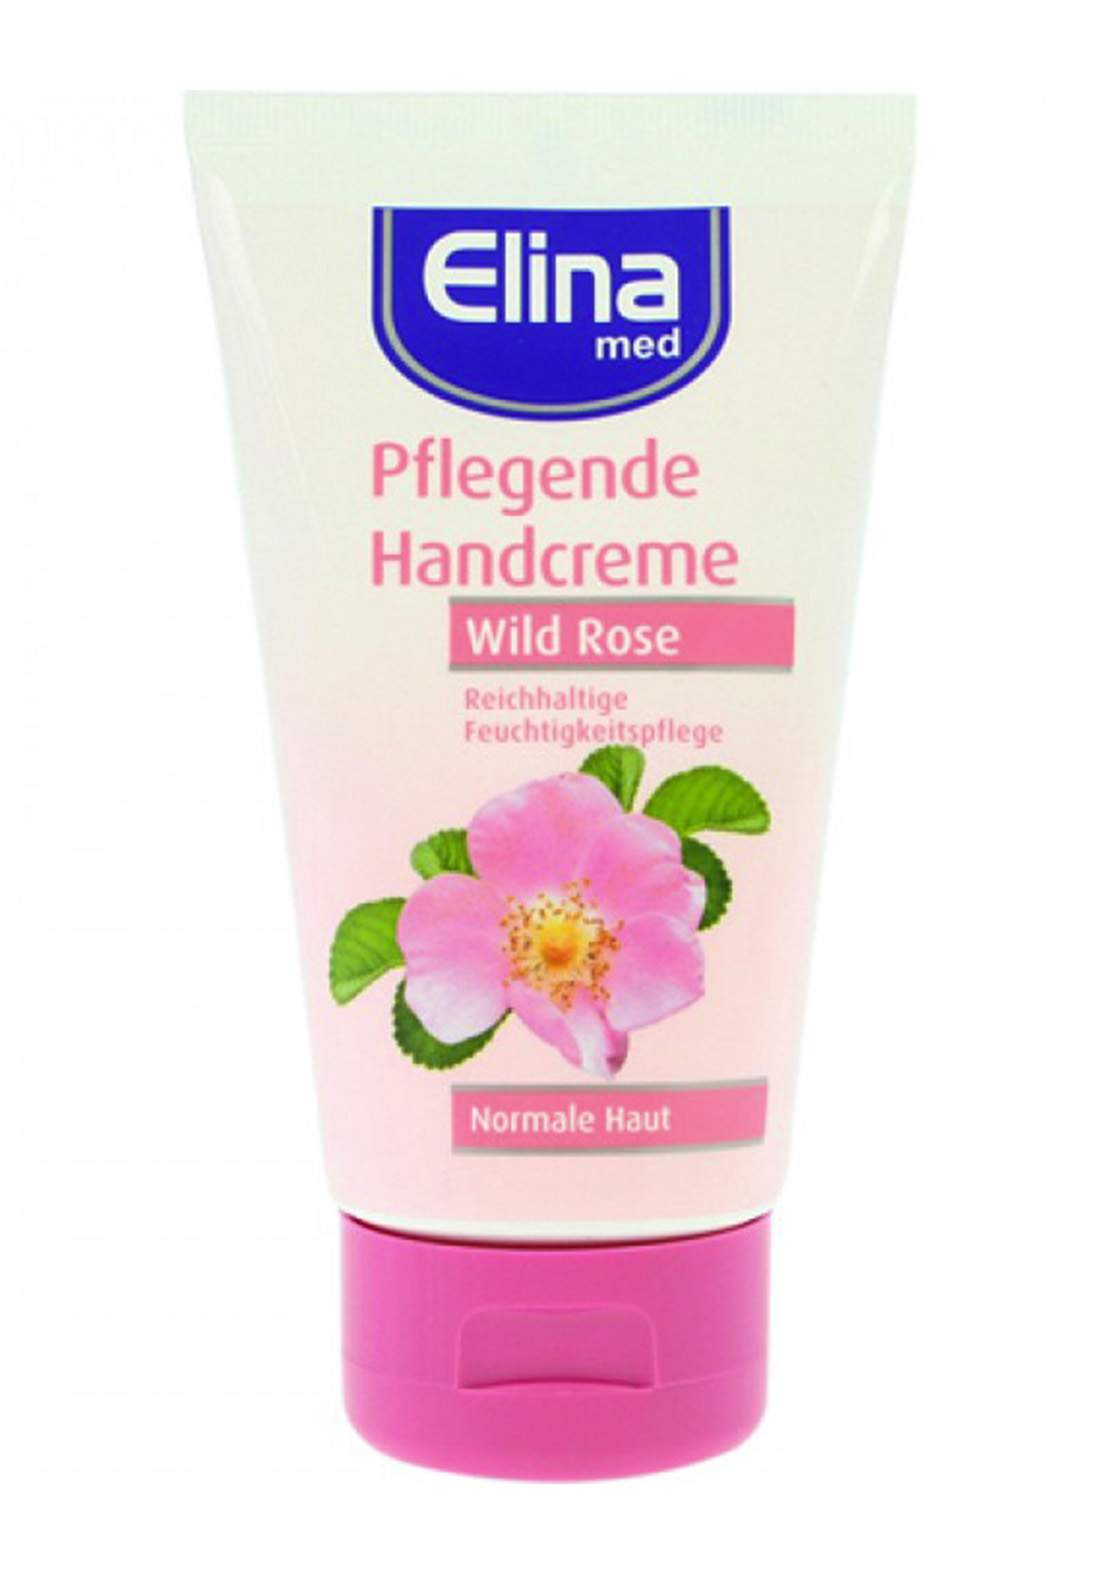 Elina-Med Cream With Wild Rose Extract For Hand And Body 150ml كريم مرطب لليدين والجسم